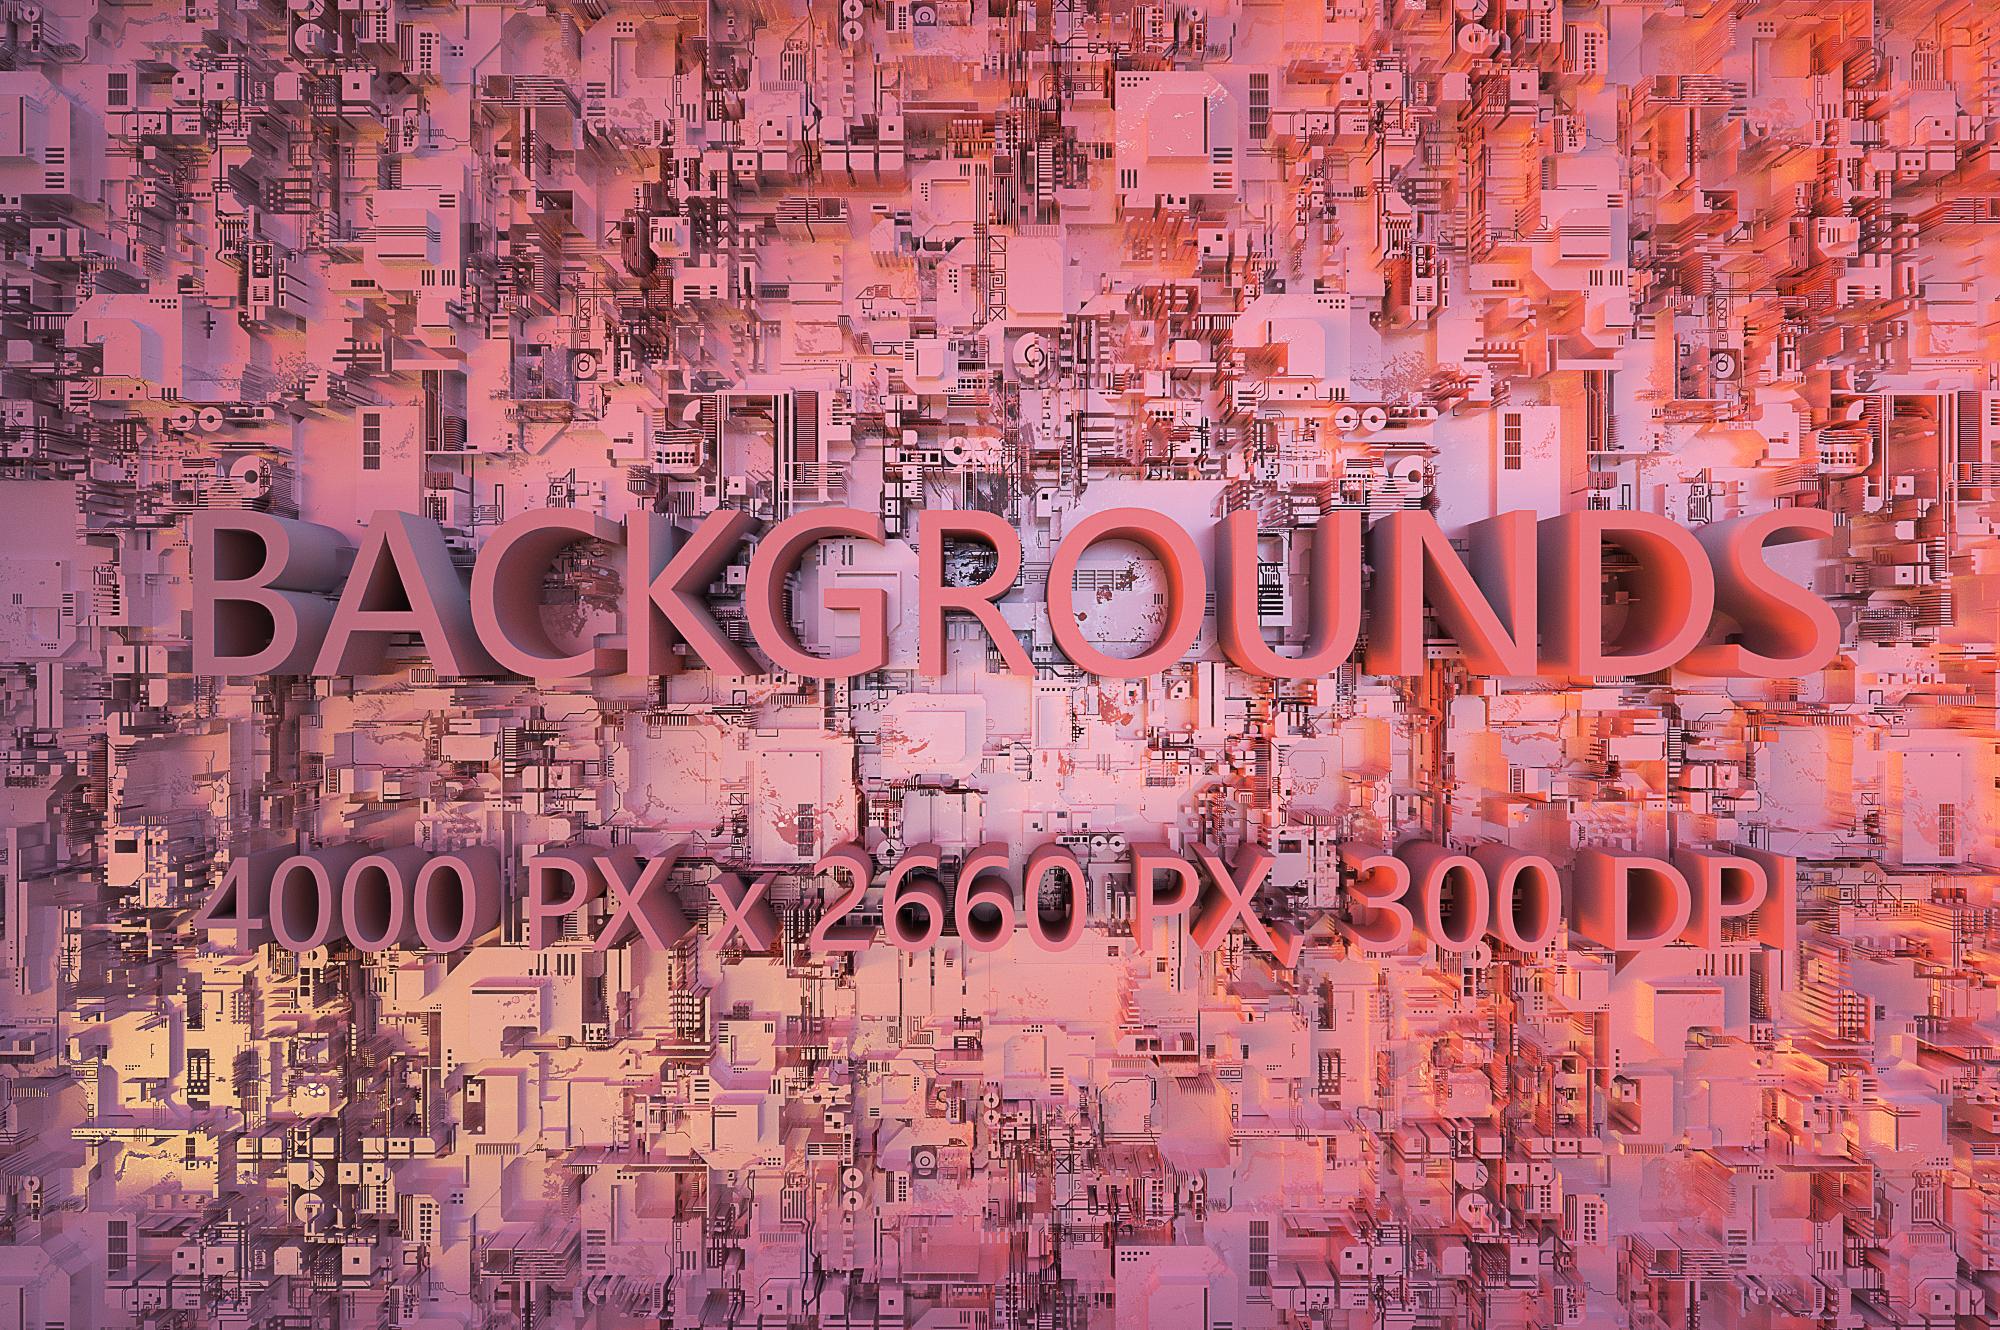 Microchip | Azbuka | Alphabet example image 11